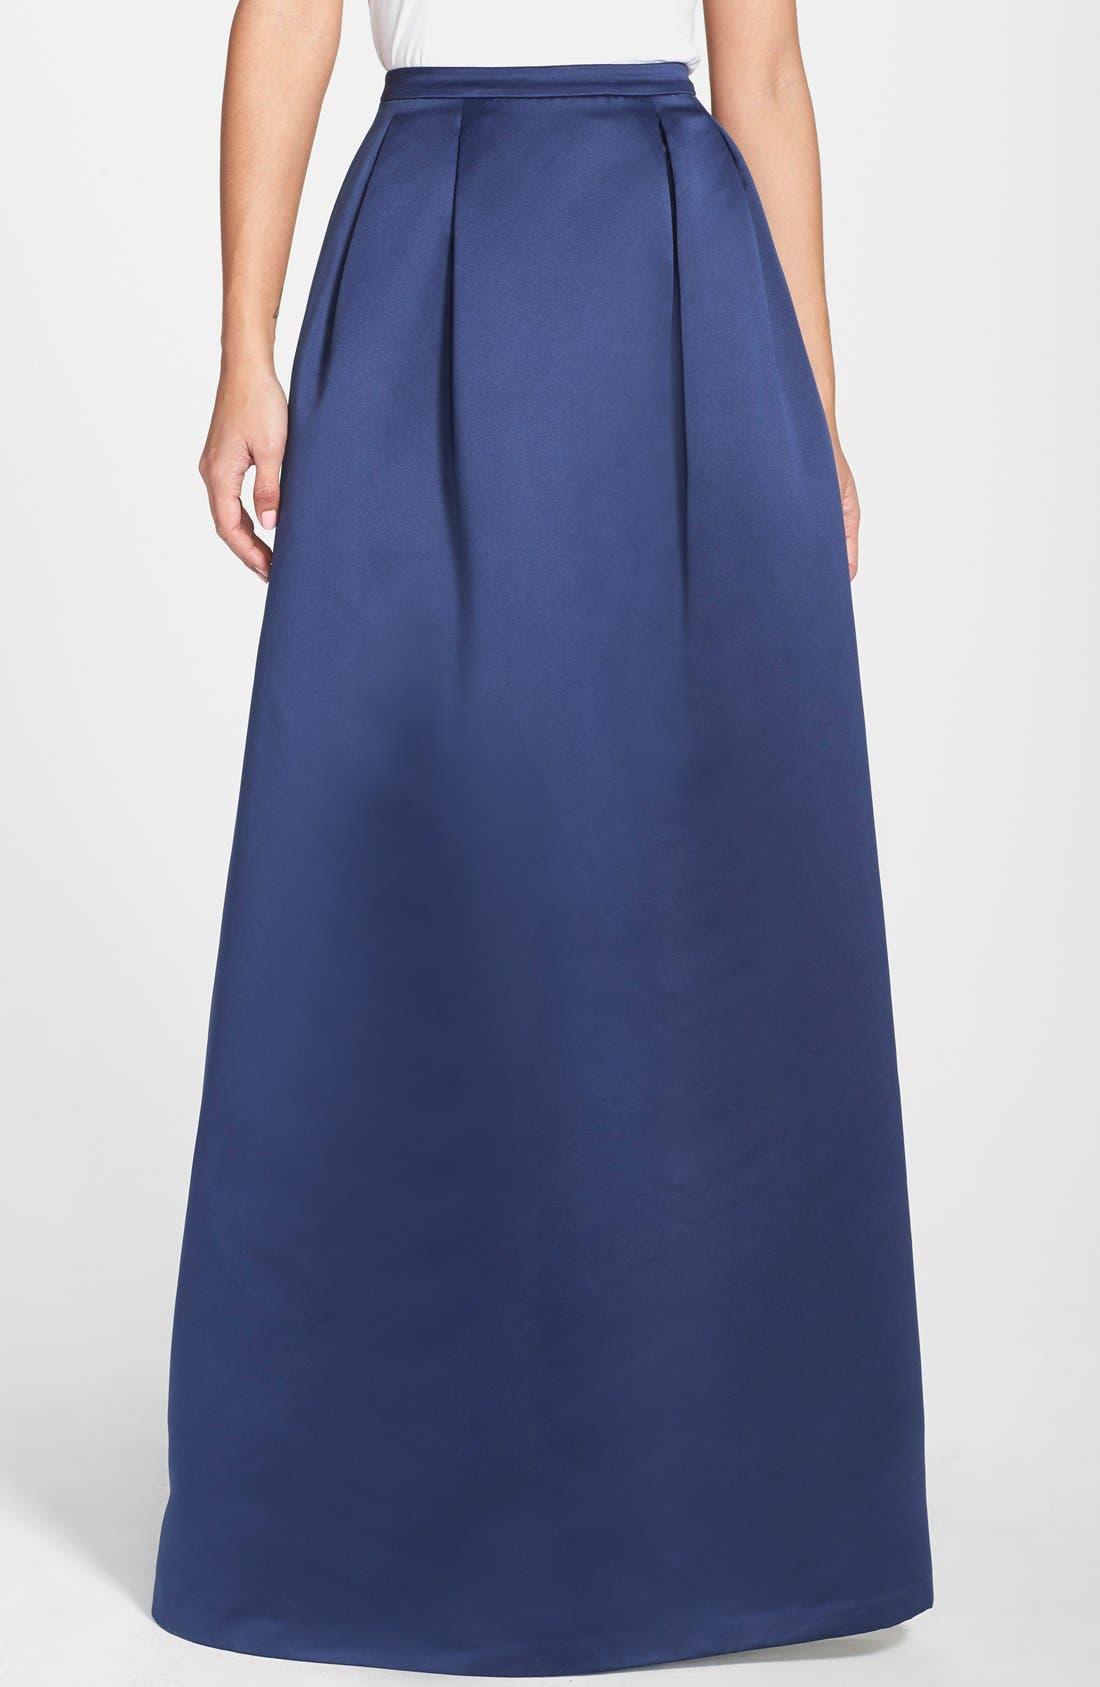 Alternate Image 1 Selected - ERIN erin fetherston 'Jacqueline' Peau de Soie Ball Skirt